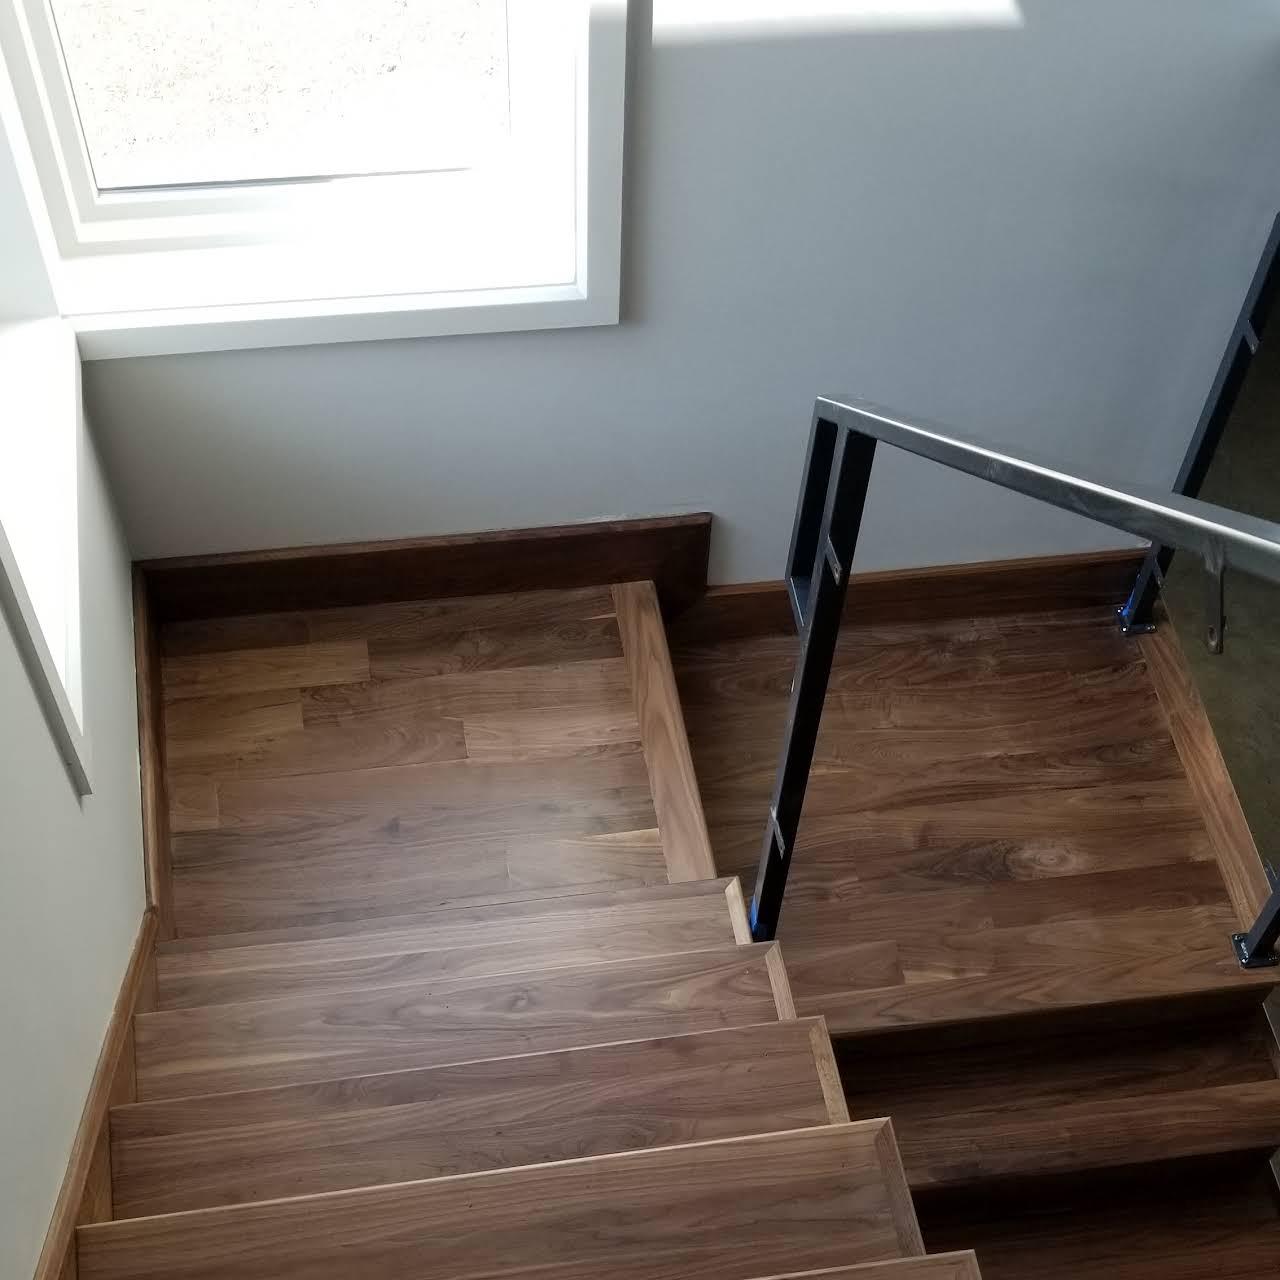 H&R Hardwood Floors - Best Local Wood Flooring Contractor ...